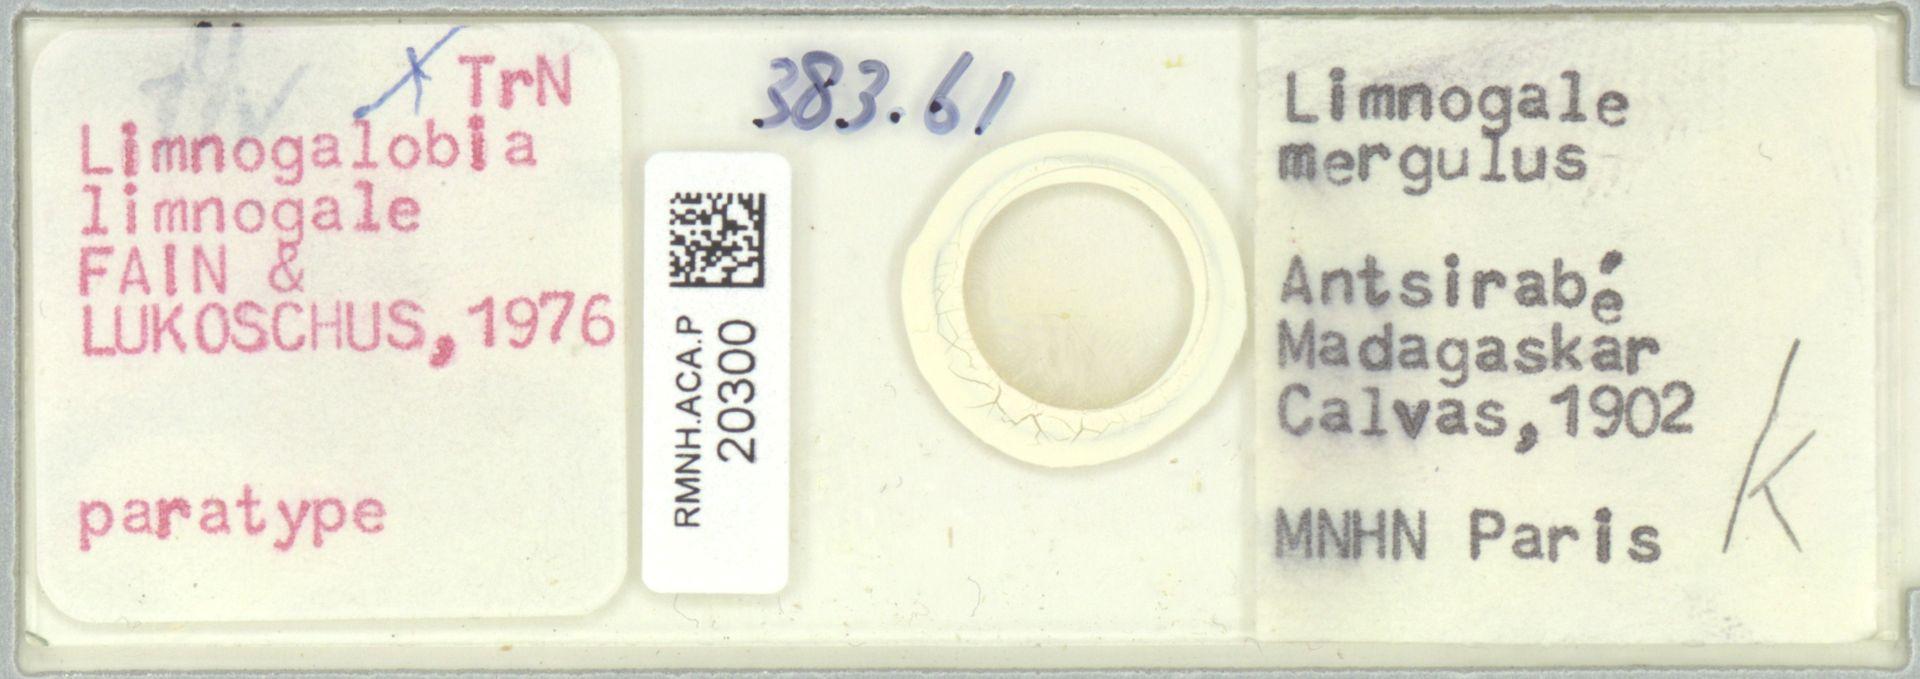 RMNH.ACA.P.20300 | Limnogalobia limnogale